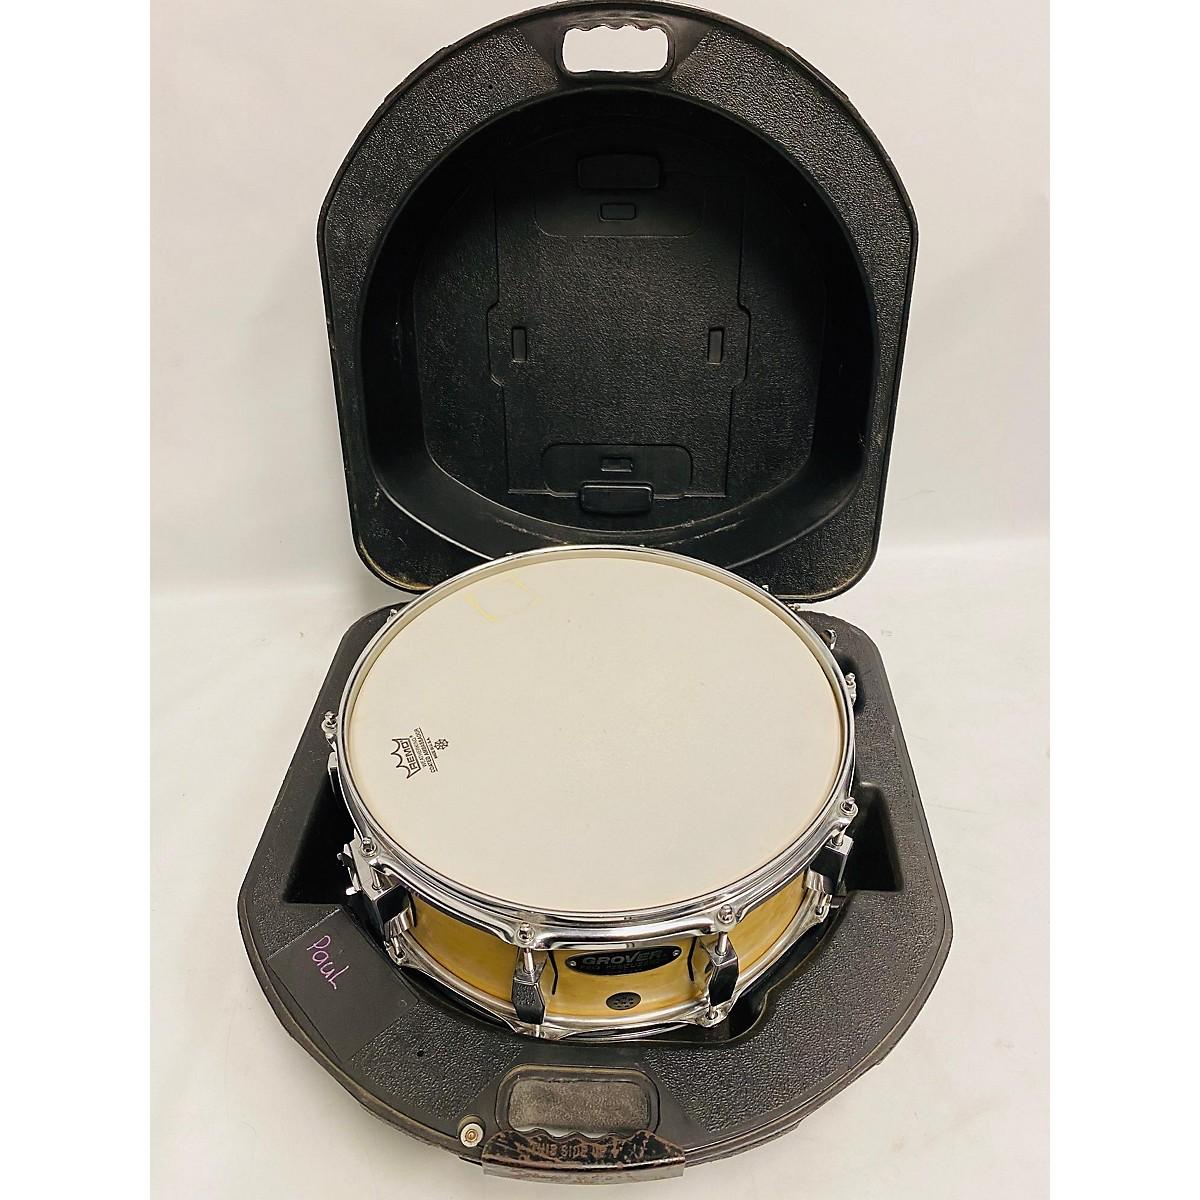 Grover Pro GSX Drum